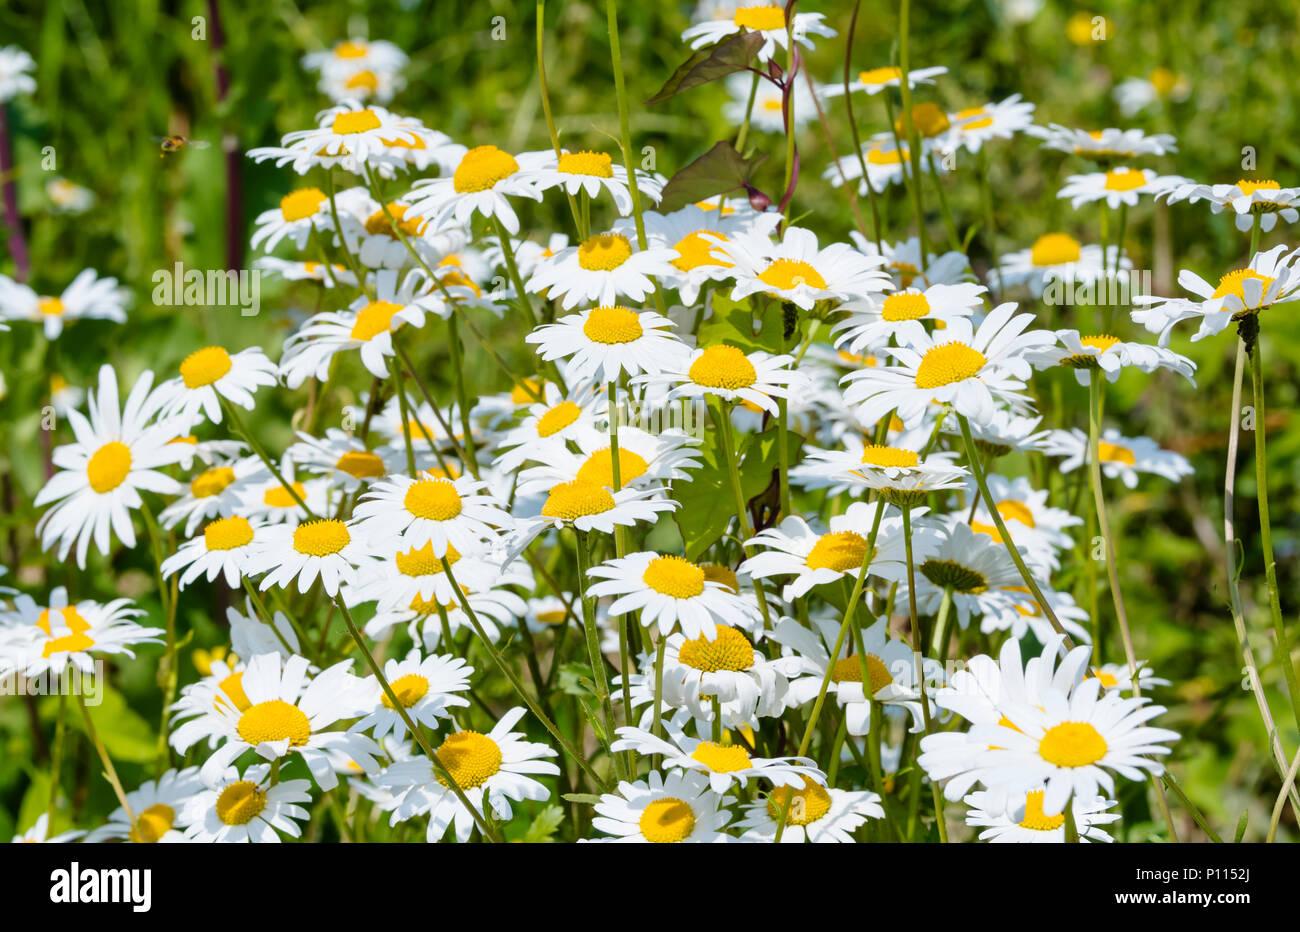 Oxeye daisies (Leucanthemum vulgare) growing in a park in Summer (June) in the UK. Stock Photo